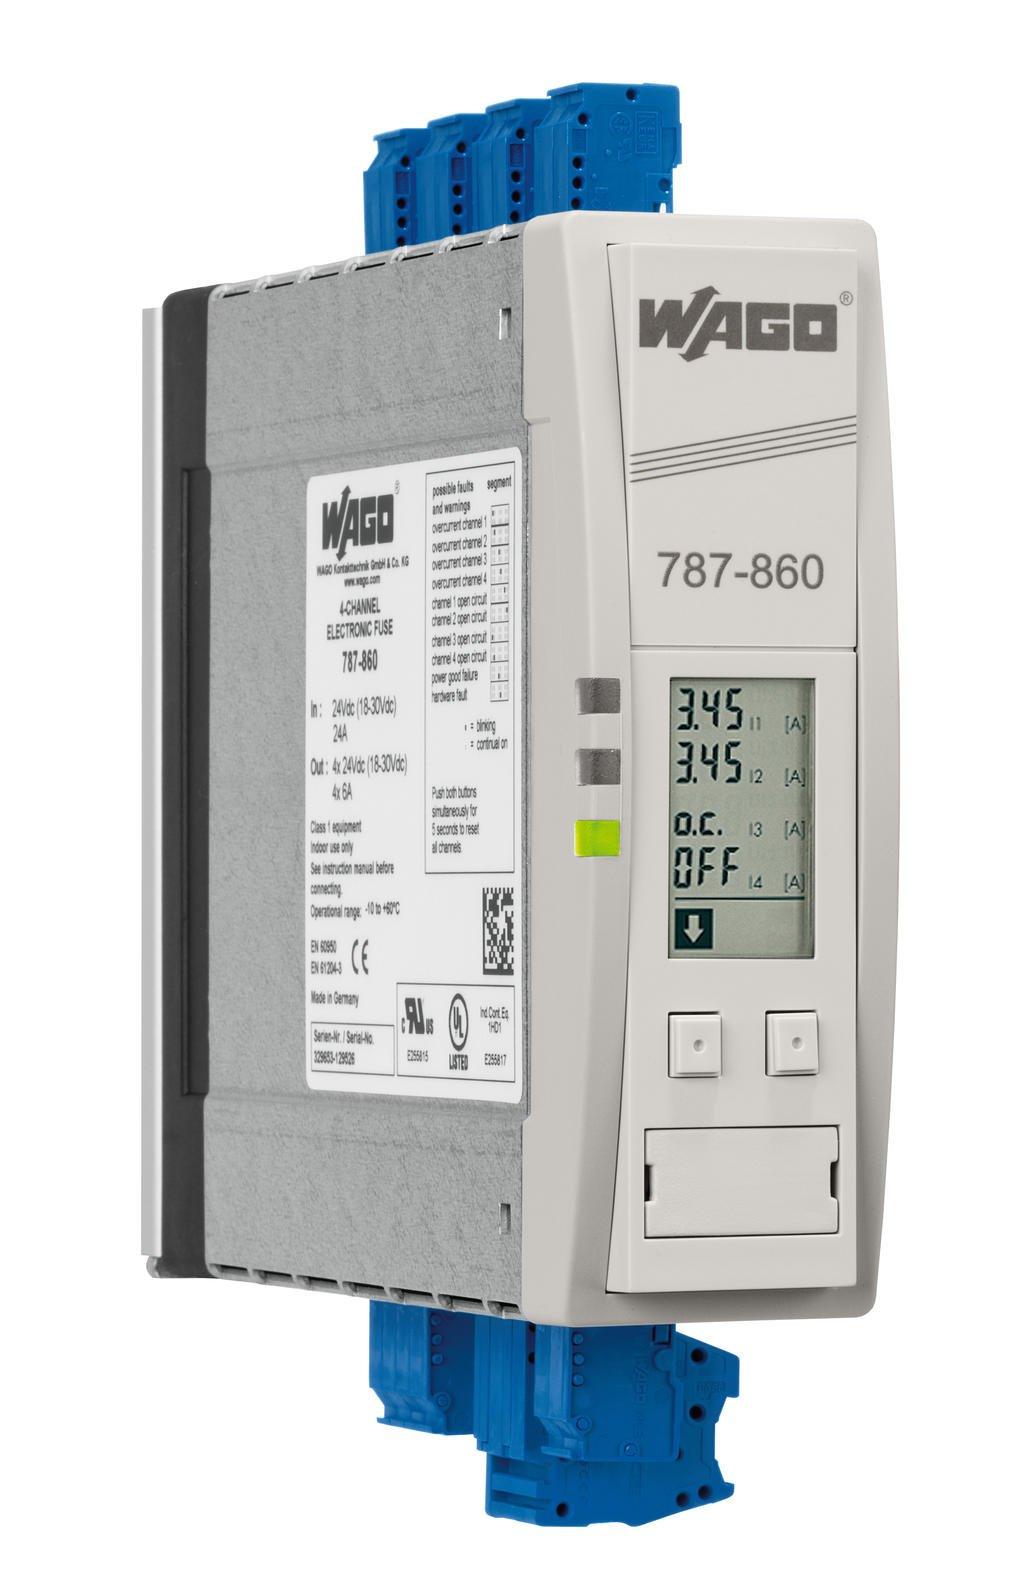 WAGO | electronic circuit breaker (787-860)